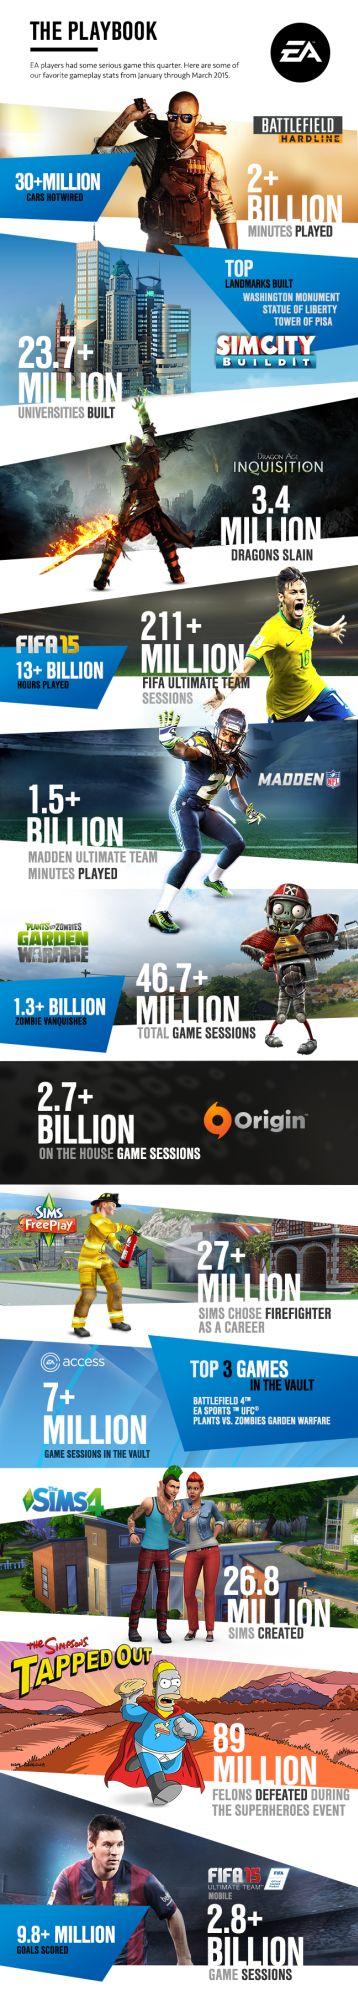 EA_Earnings_InfographicQ12015